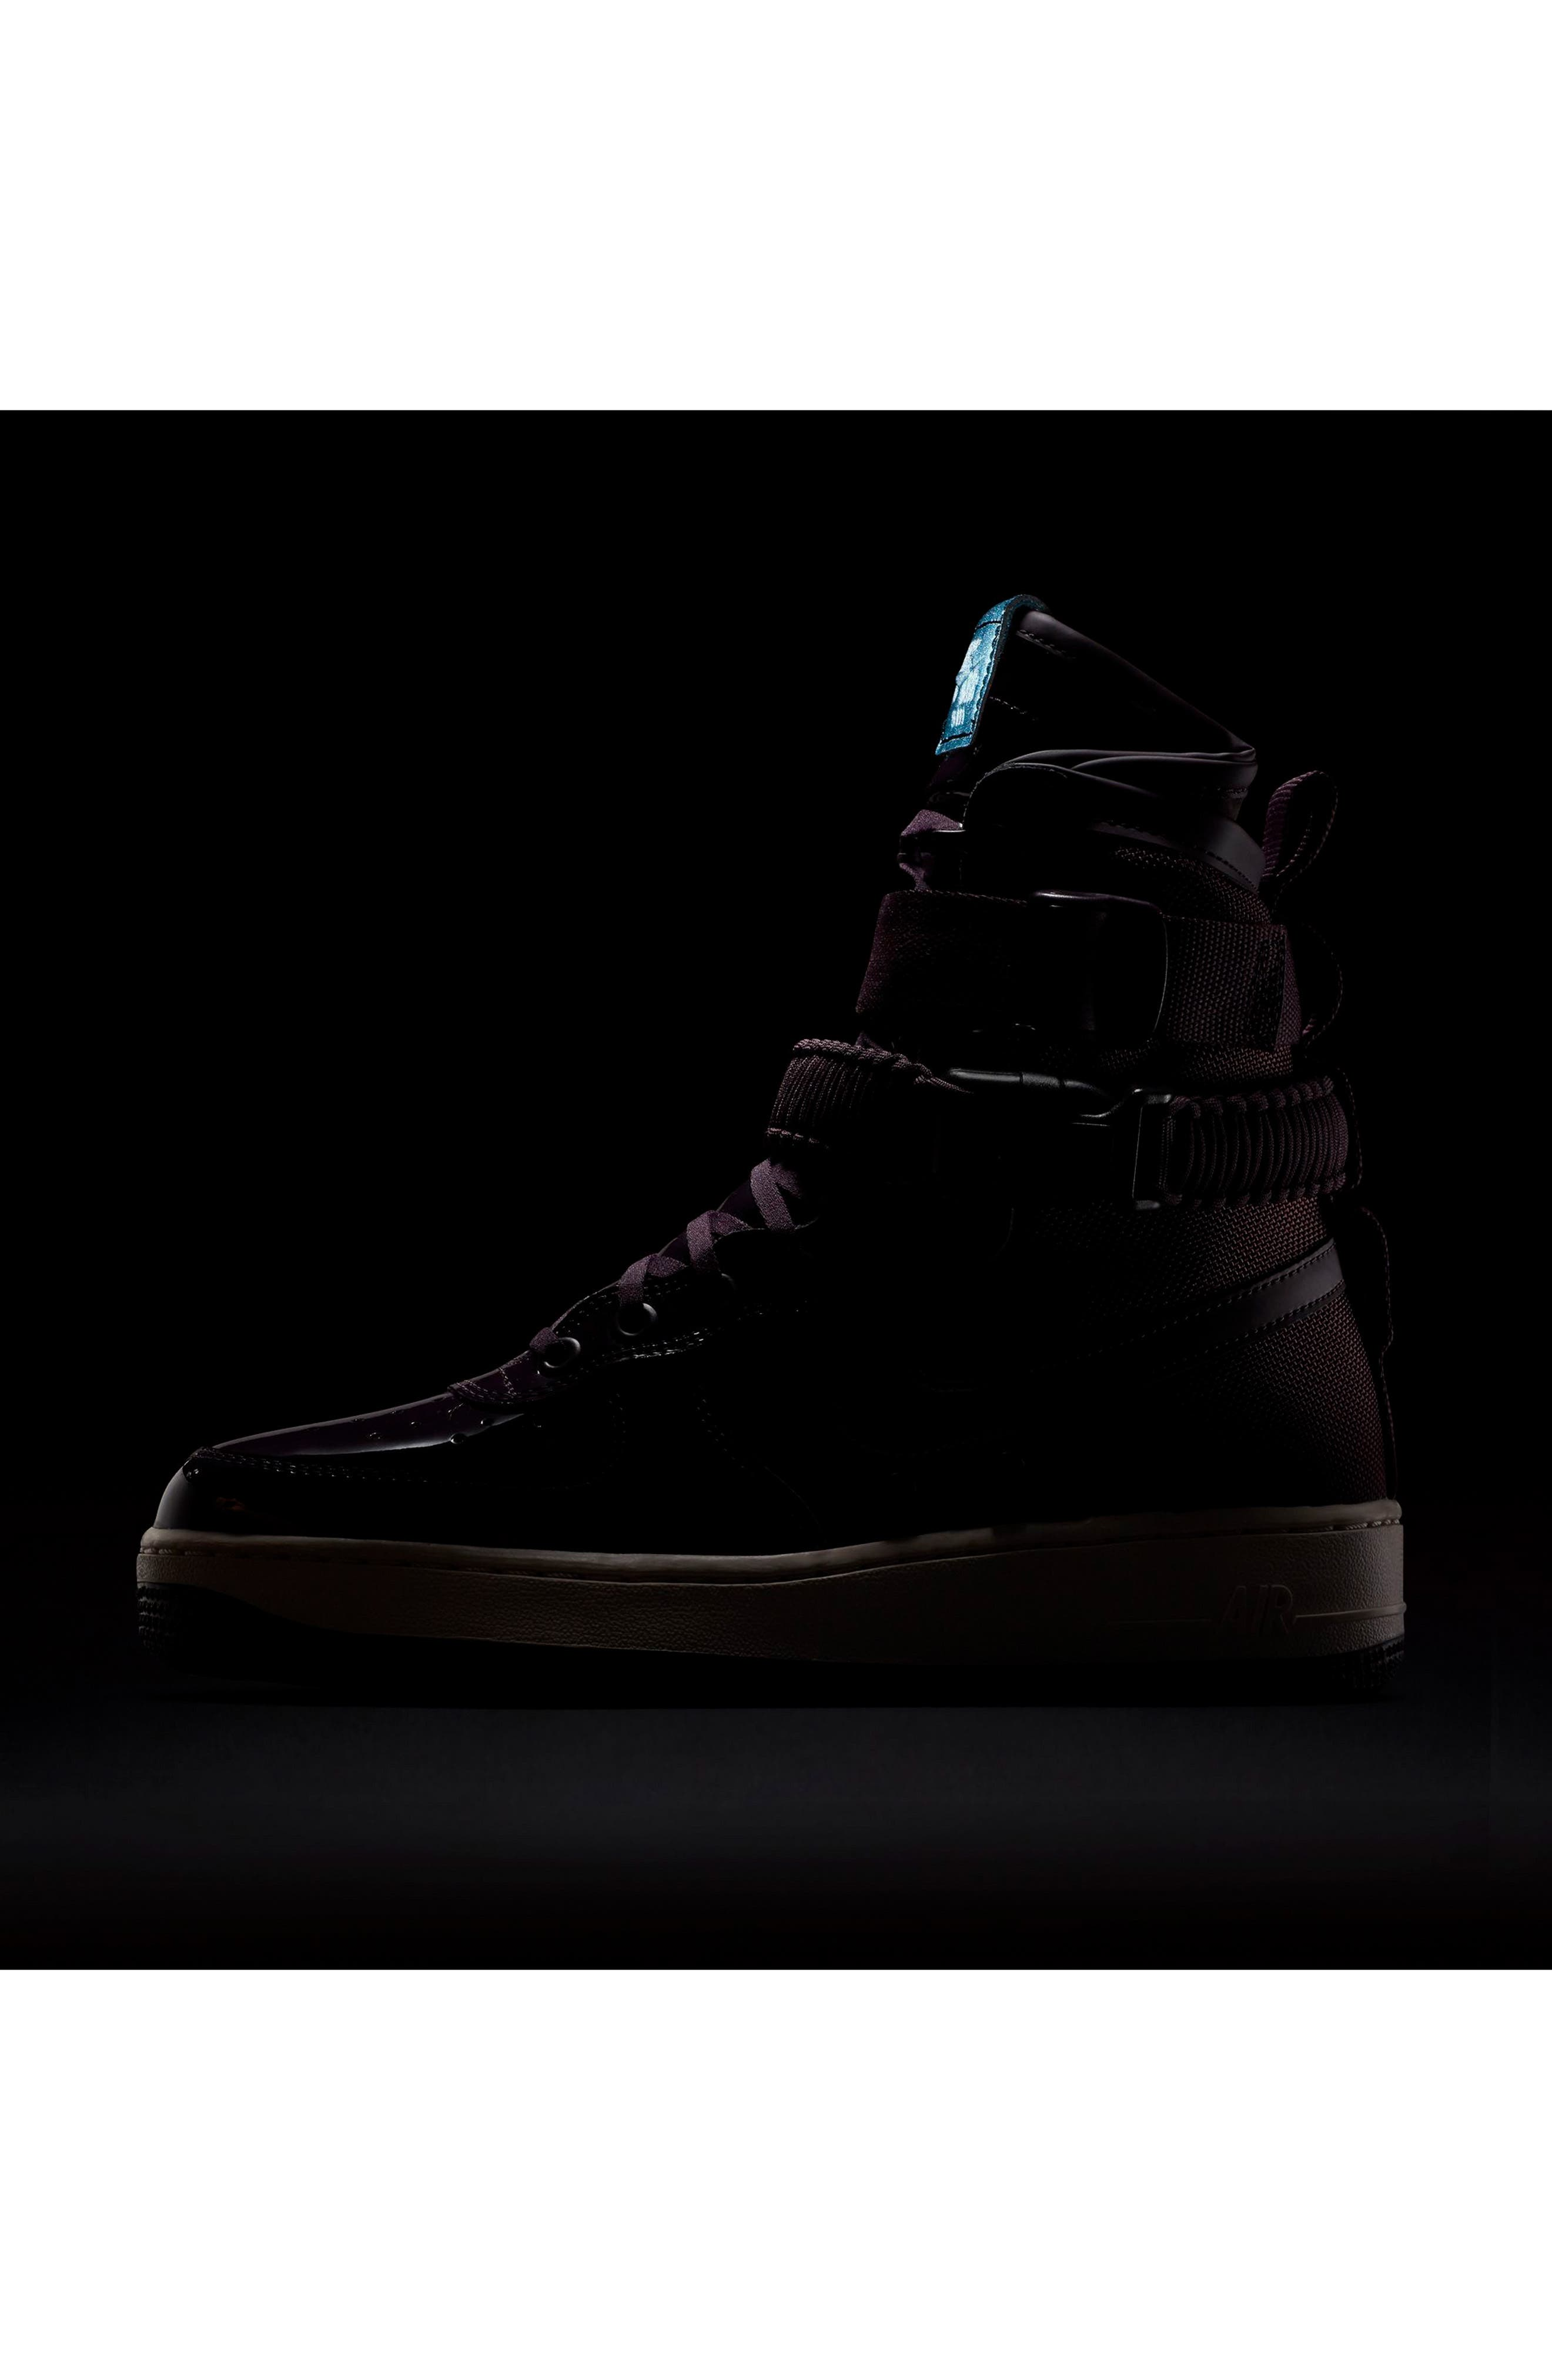 SF Air Force 1 High Top Sneaker,                             Alternate thumbnail 7, color,                             Port Wine/ Port Wine